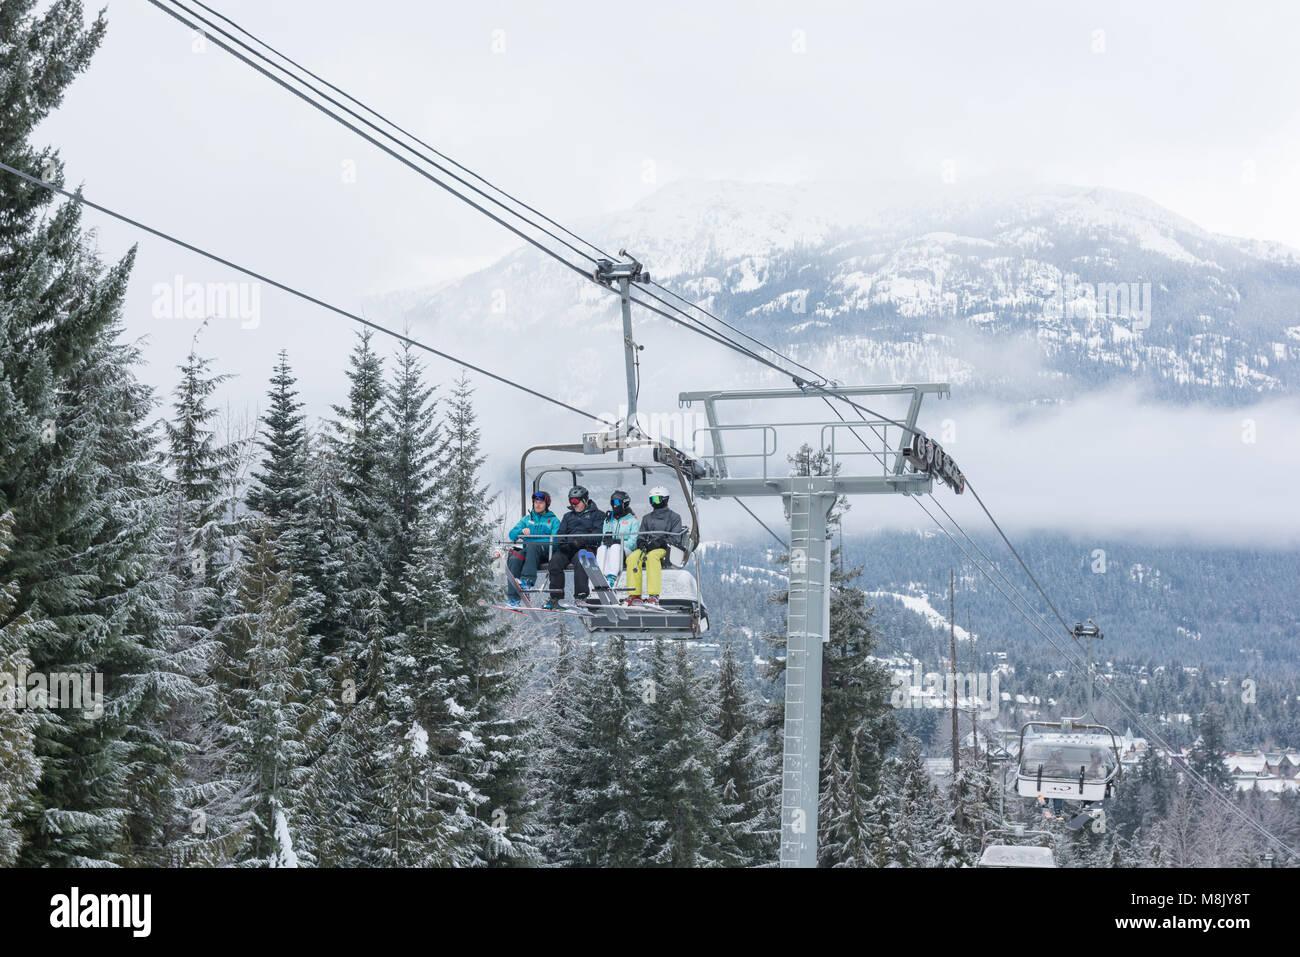 Chairlift at Whistler Blackcomb ski resort, British Columbia. Stock Photo